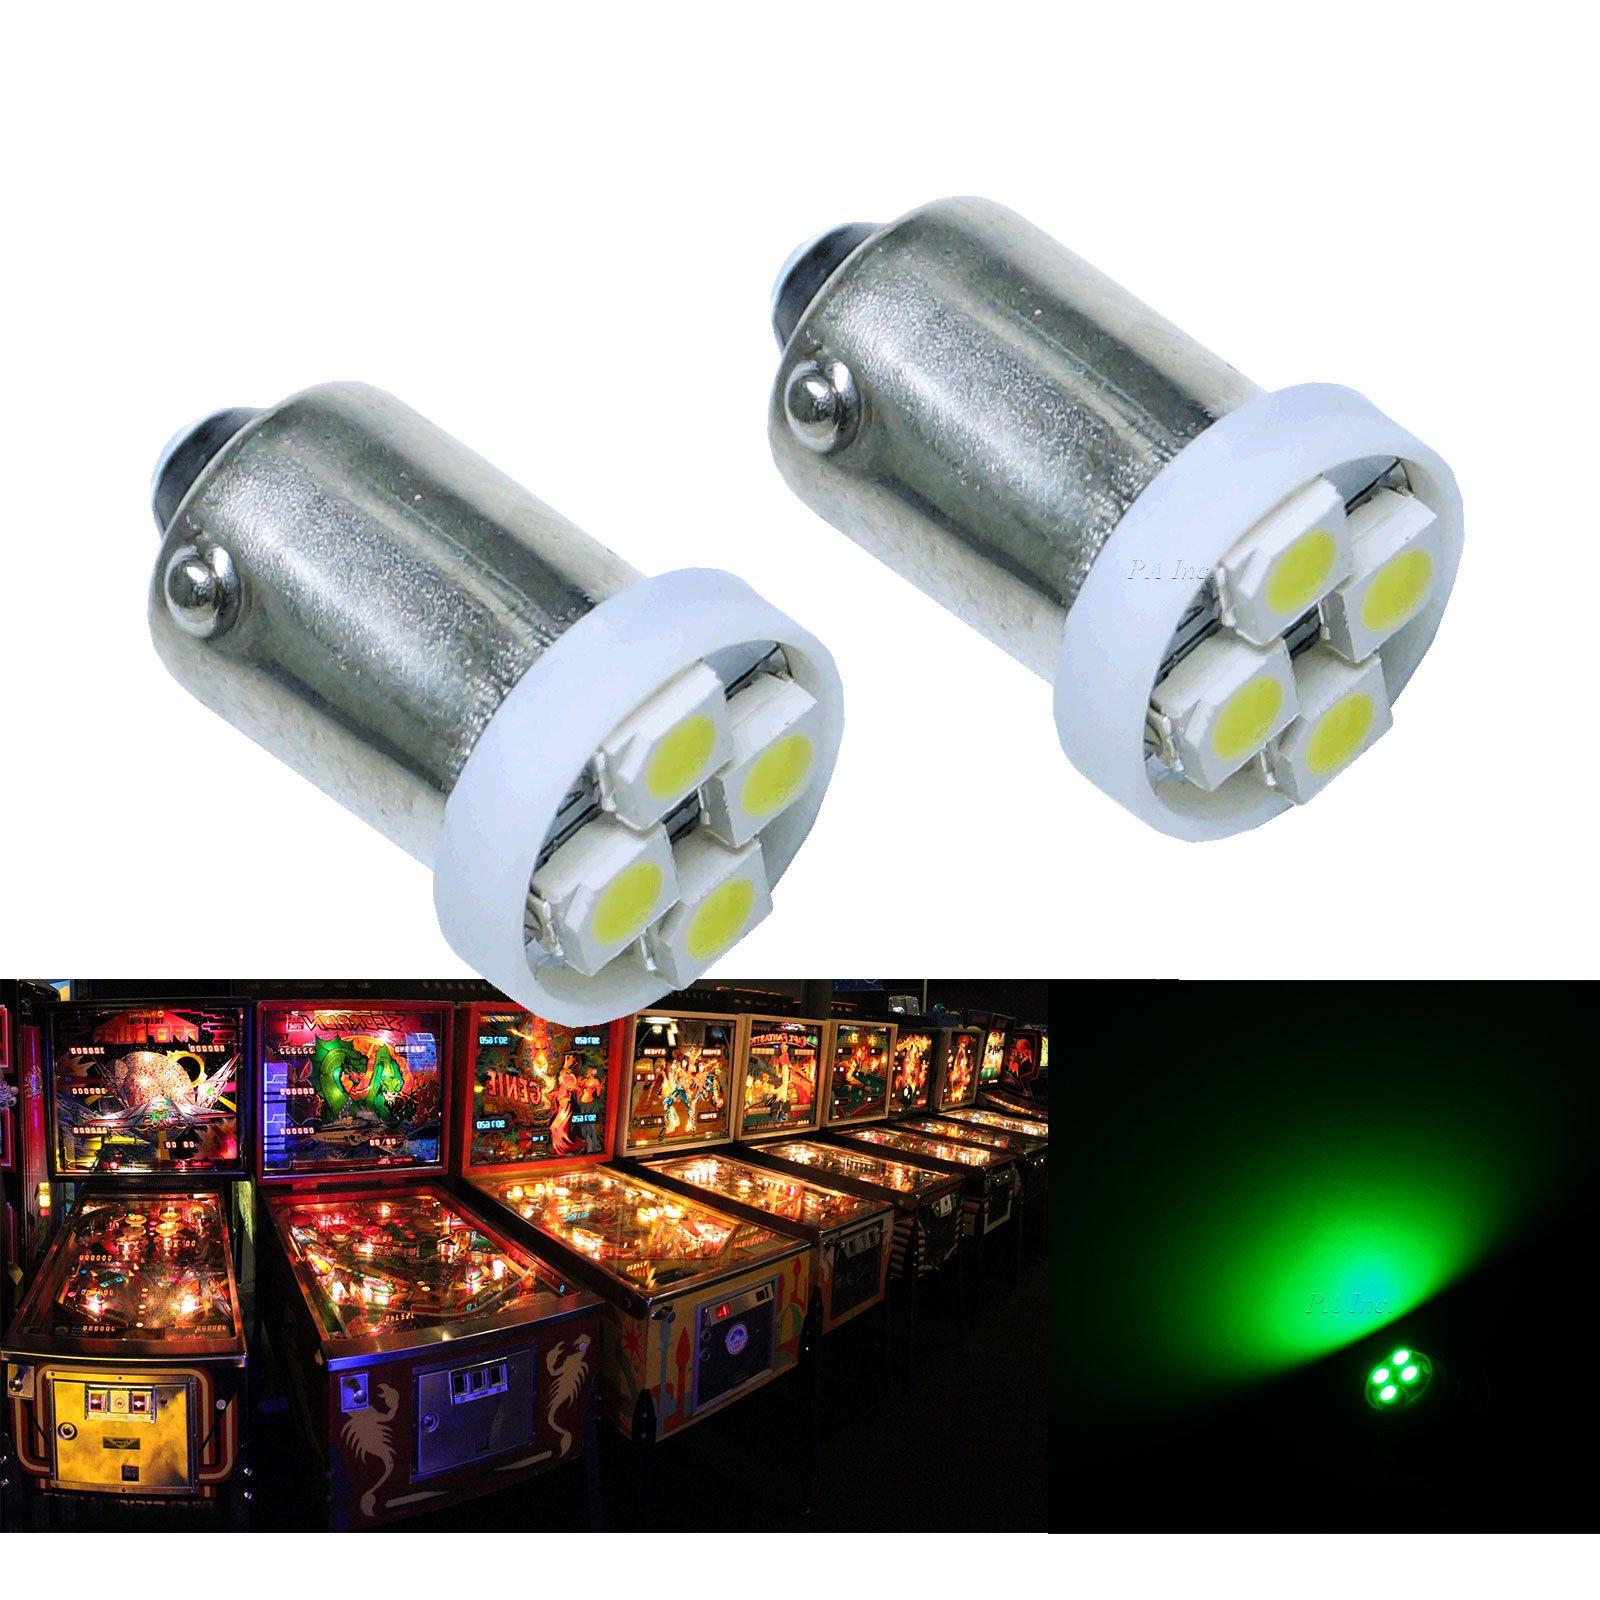 PA® 10PCS #1893 #44 #47 #756 #1847 BA9S 4SMD LED Wedge Pinball Machine Light Bulb Green-6.3V